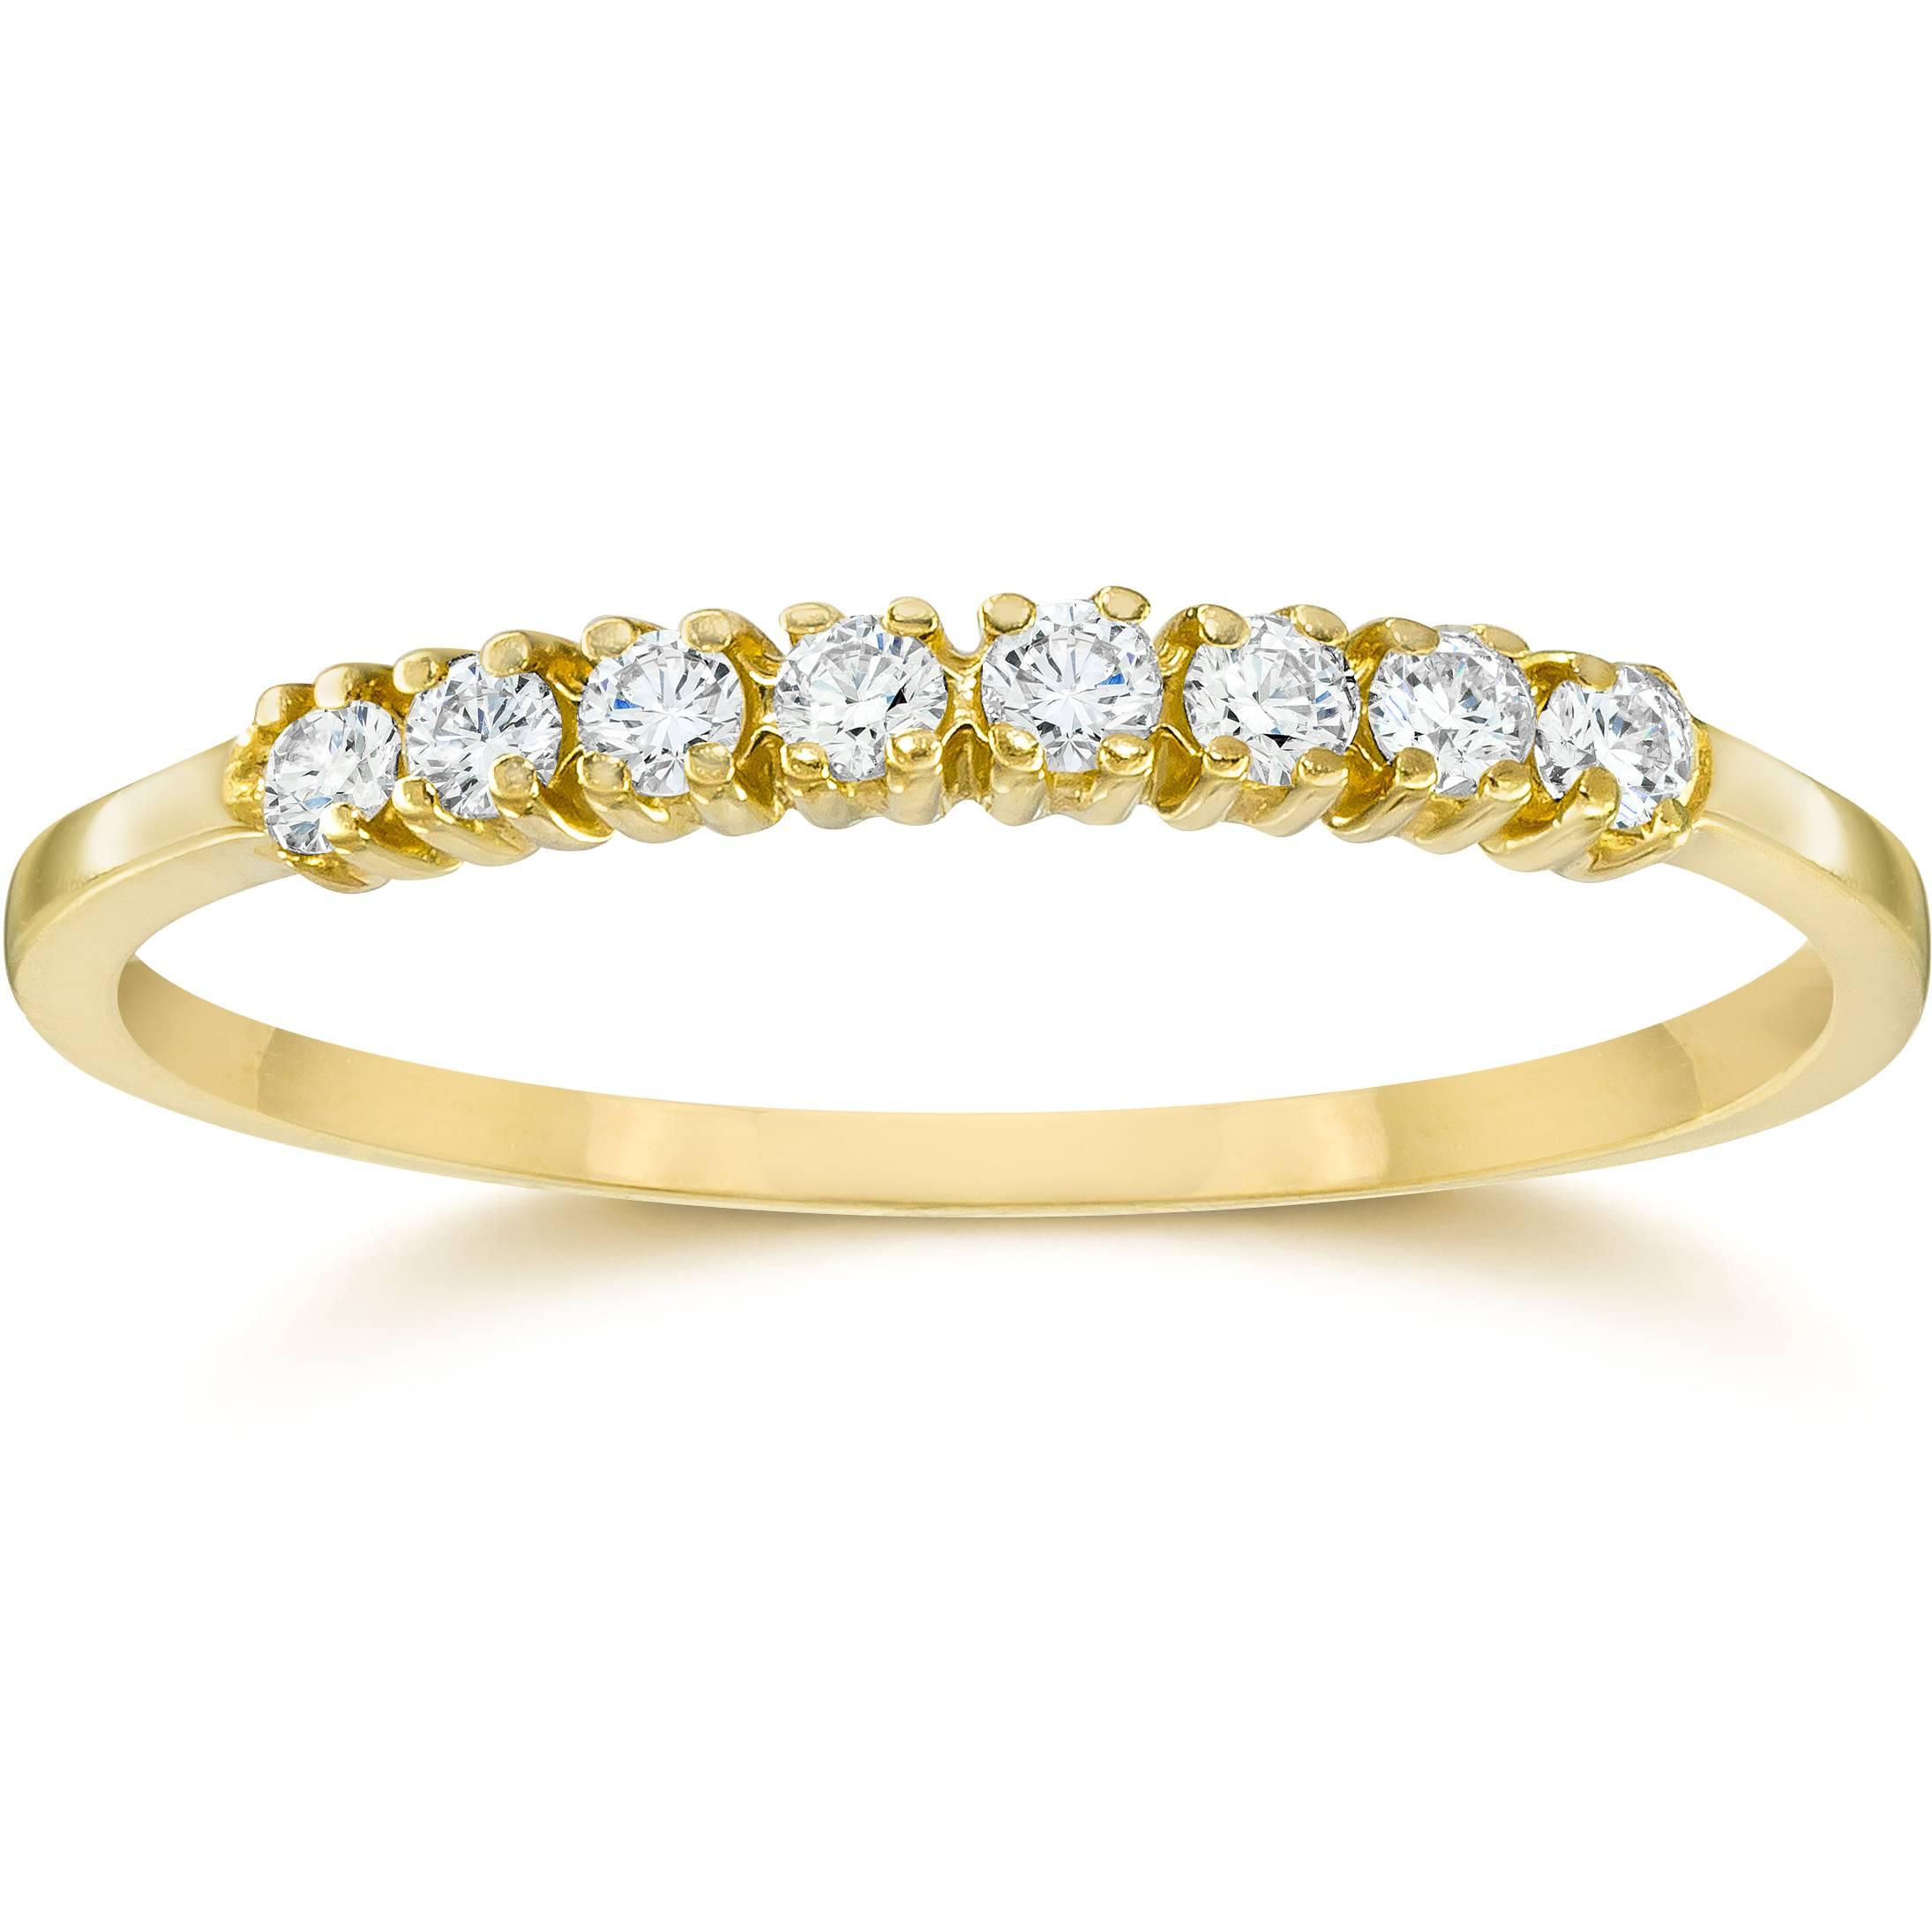 1 5ct ring 10k yellow gold ebay